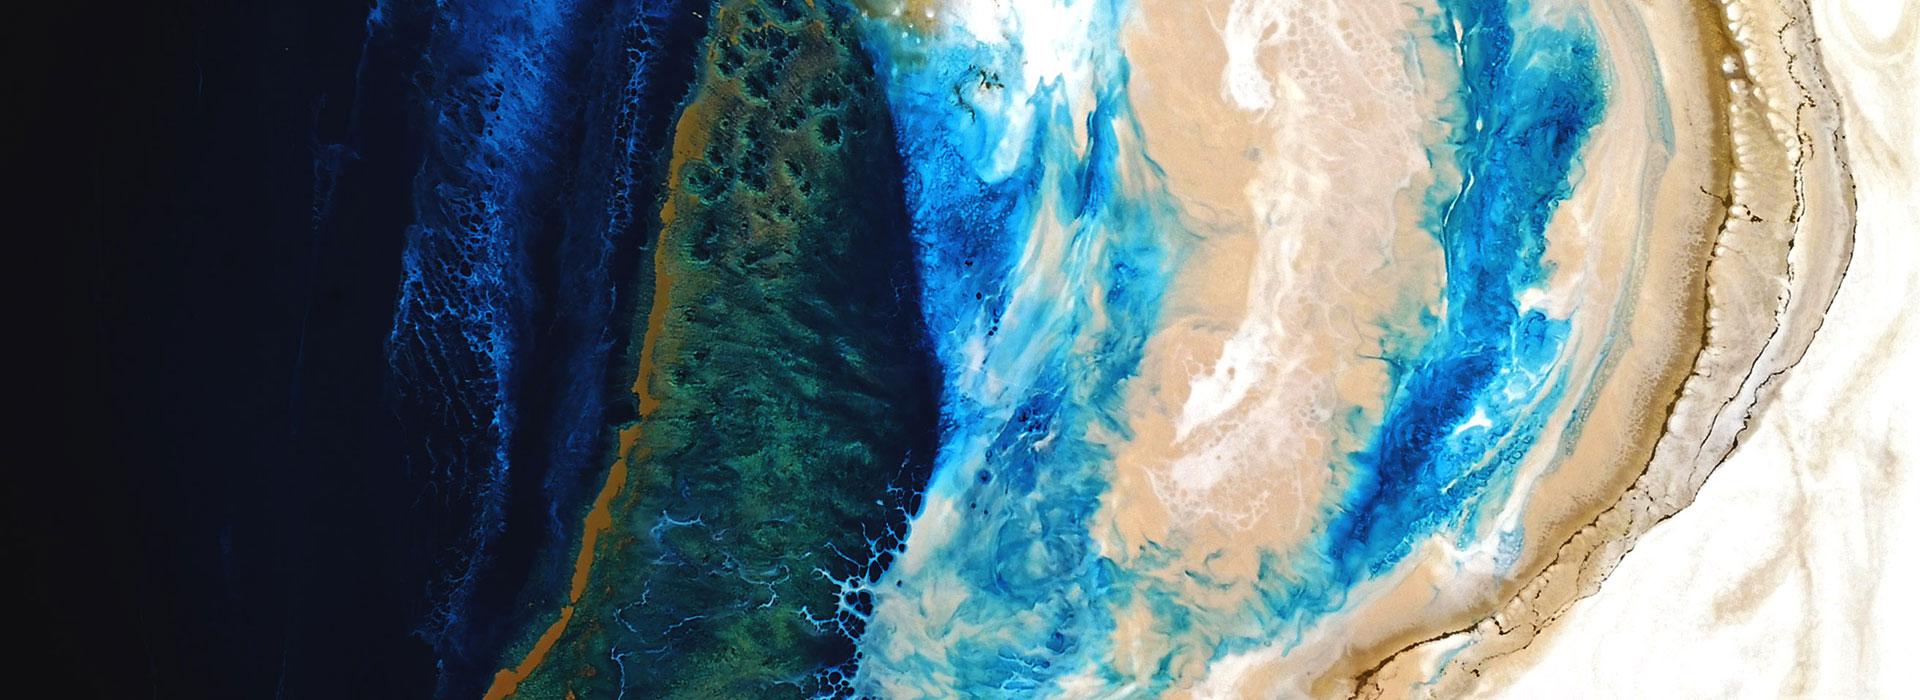 Marble waves